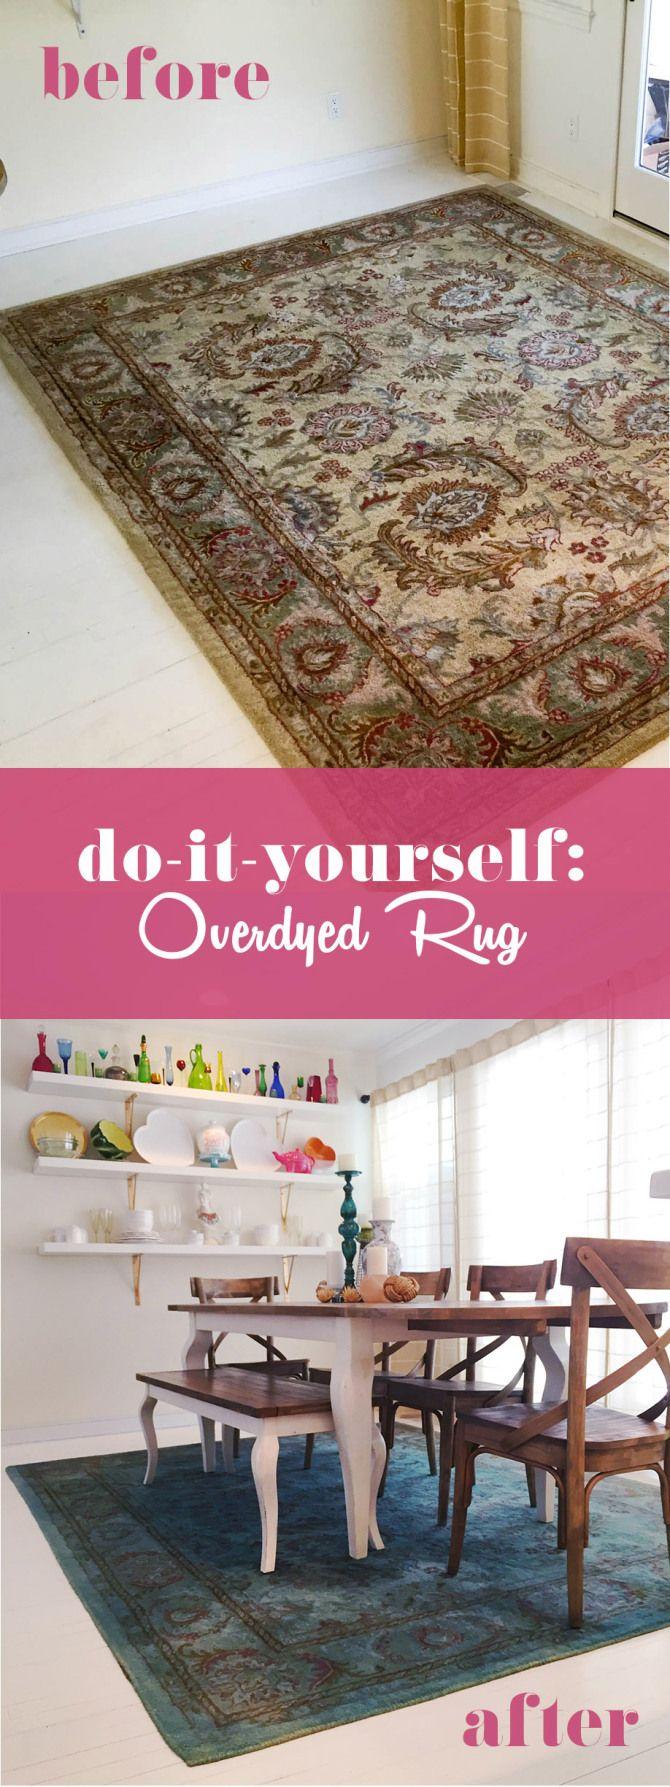 Overdyed Rug with RIT fabric dye DIY | Home idears | Diy ...